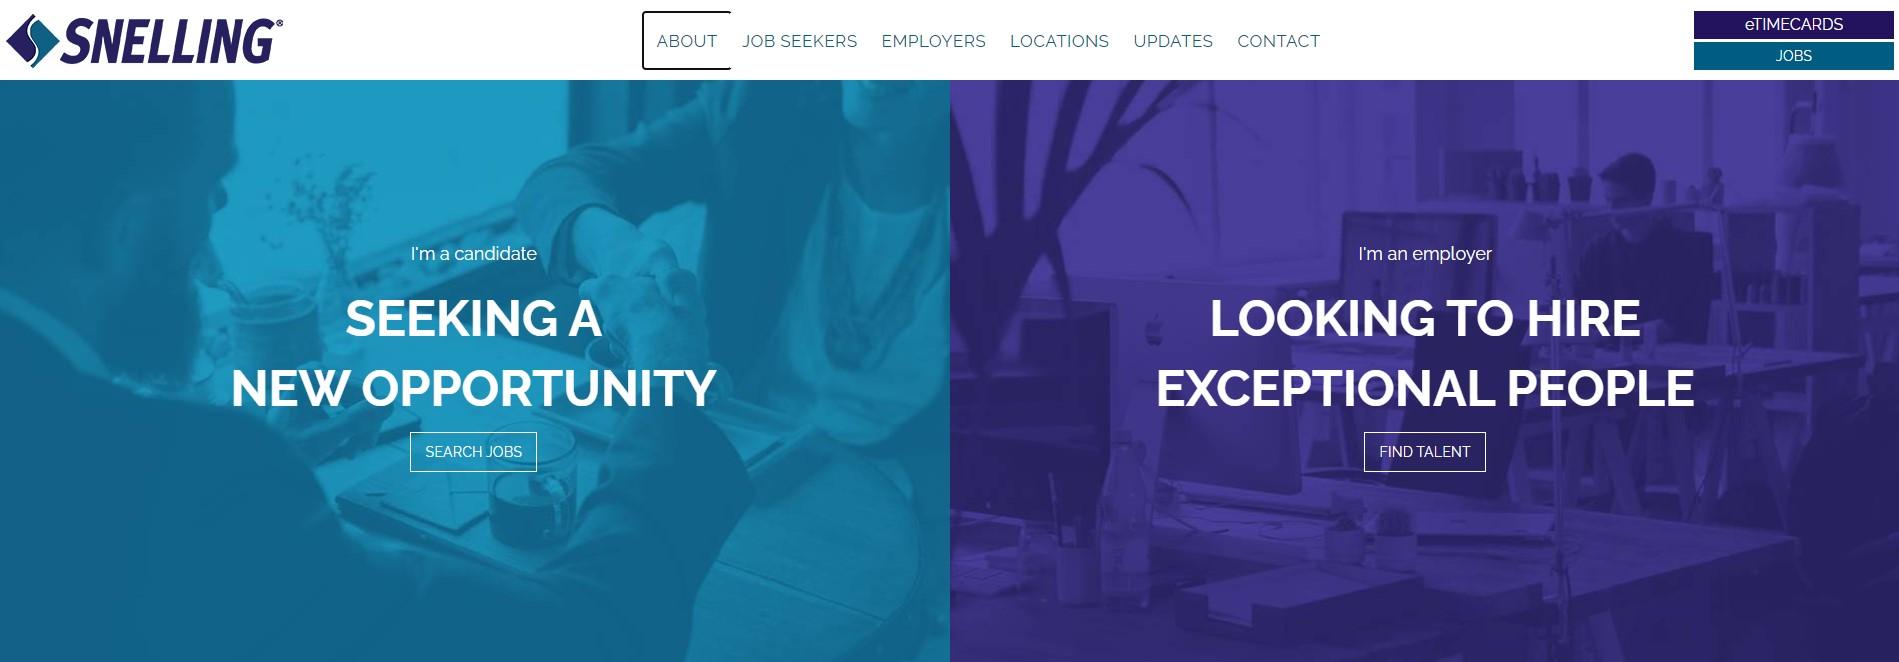 Snelling - Best Charlotte Staffing Agencies